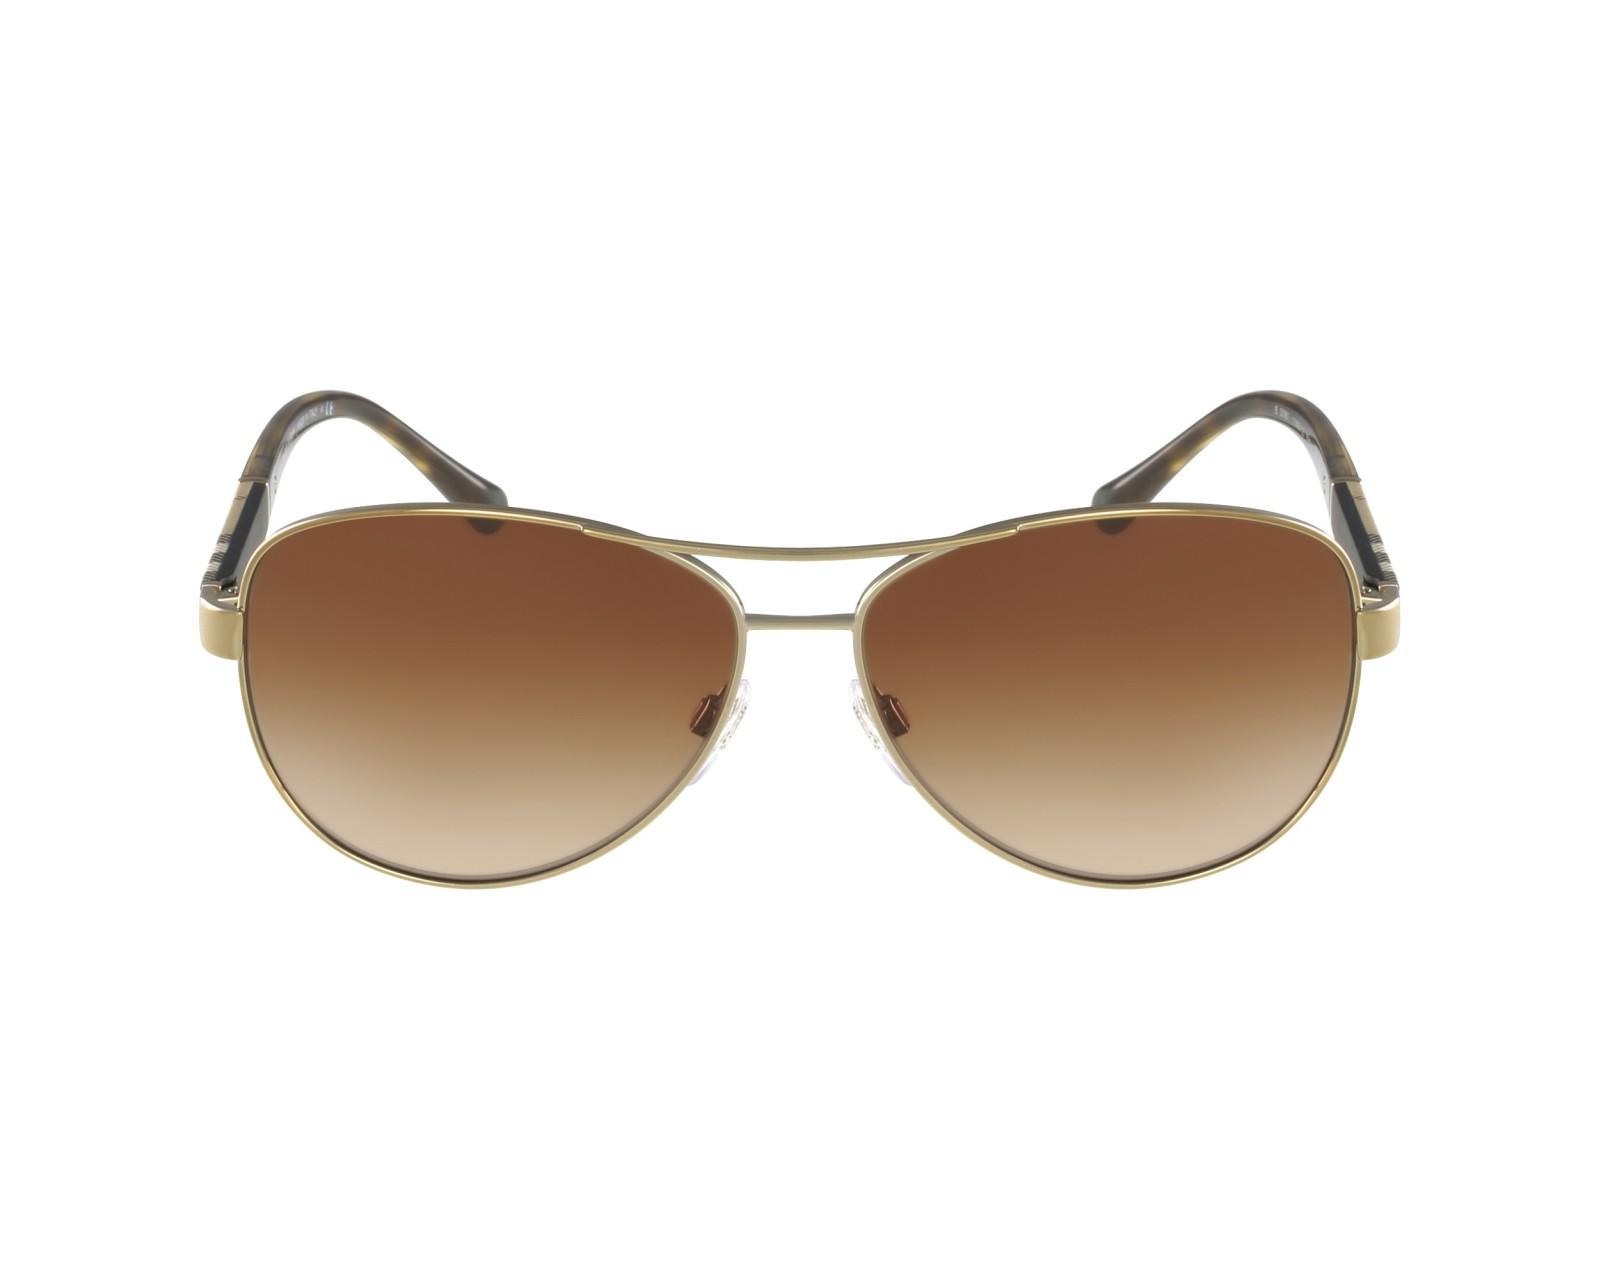 Polarized Burberry Sunglasses  burberry sunglasses be3080 1145 13 59 visionet